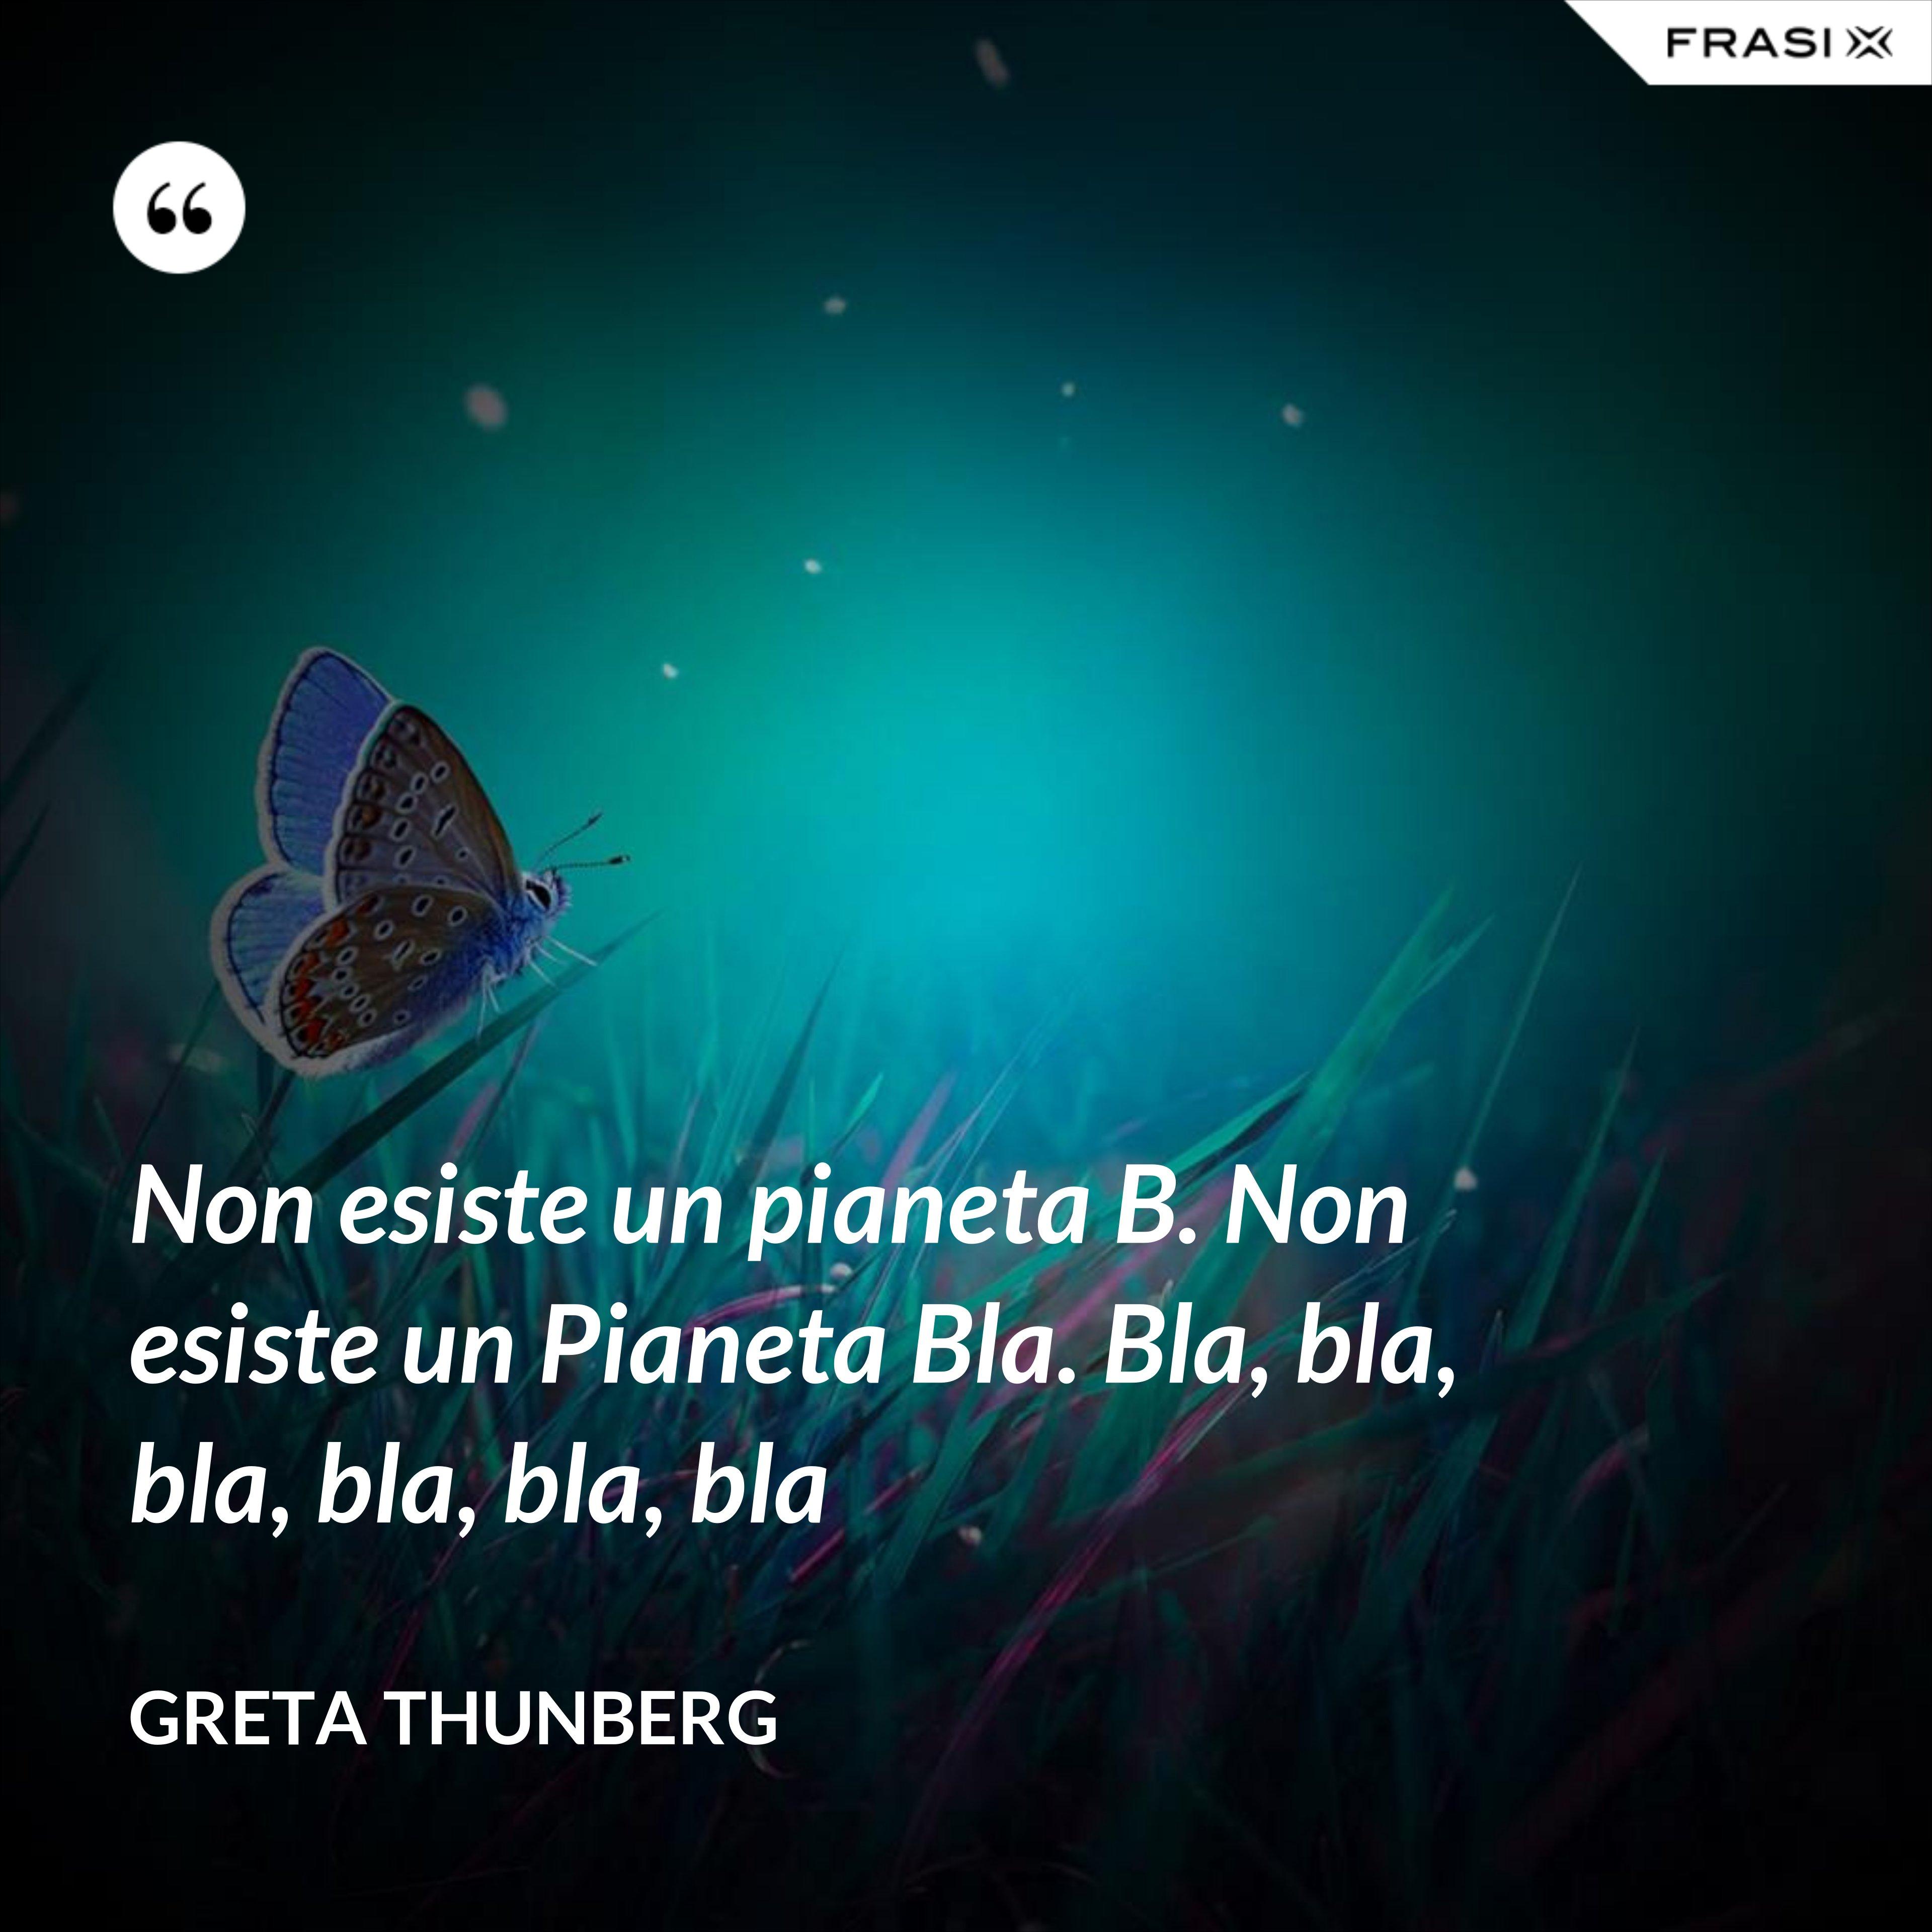 Non esiste un pianeta B. Non esiste un Pianeta Bla. Bla, bla, bla, bla, bla, bla - Greta Thunberg